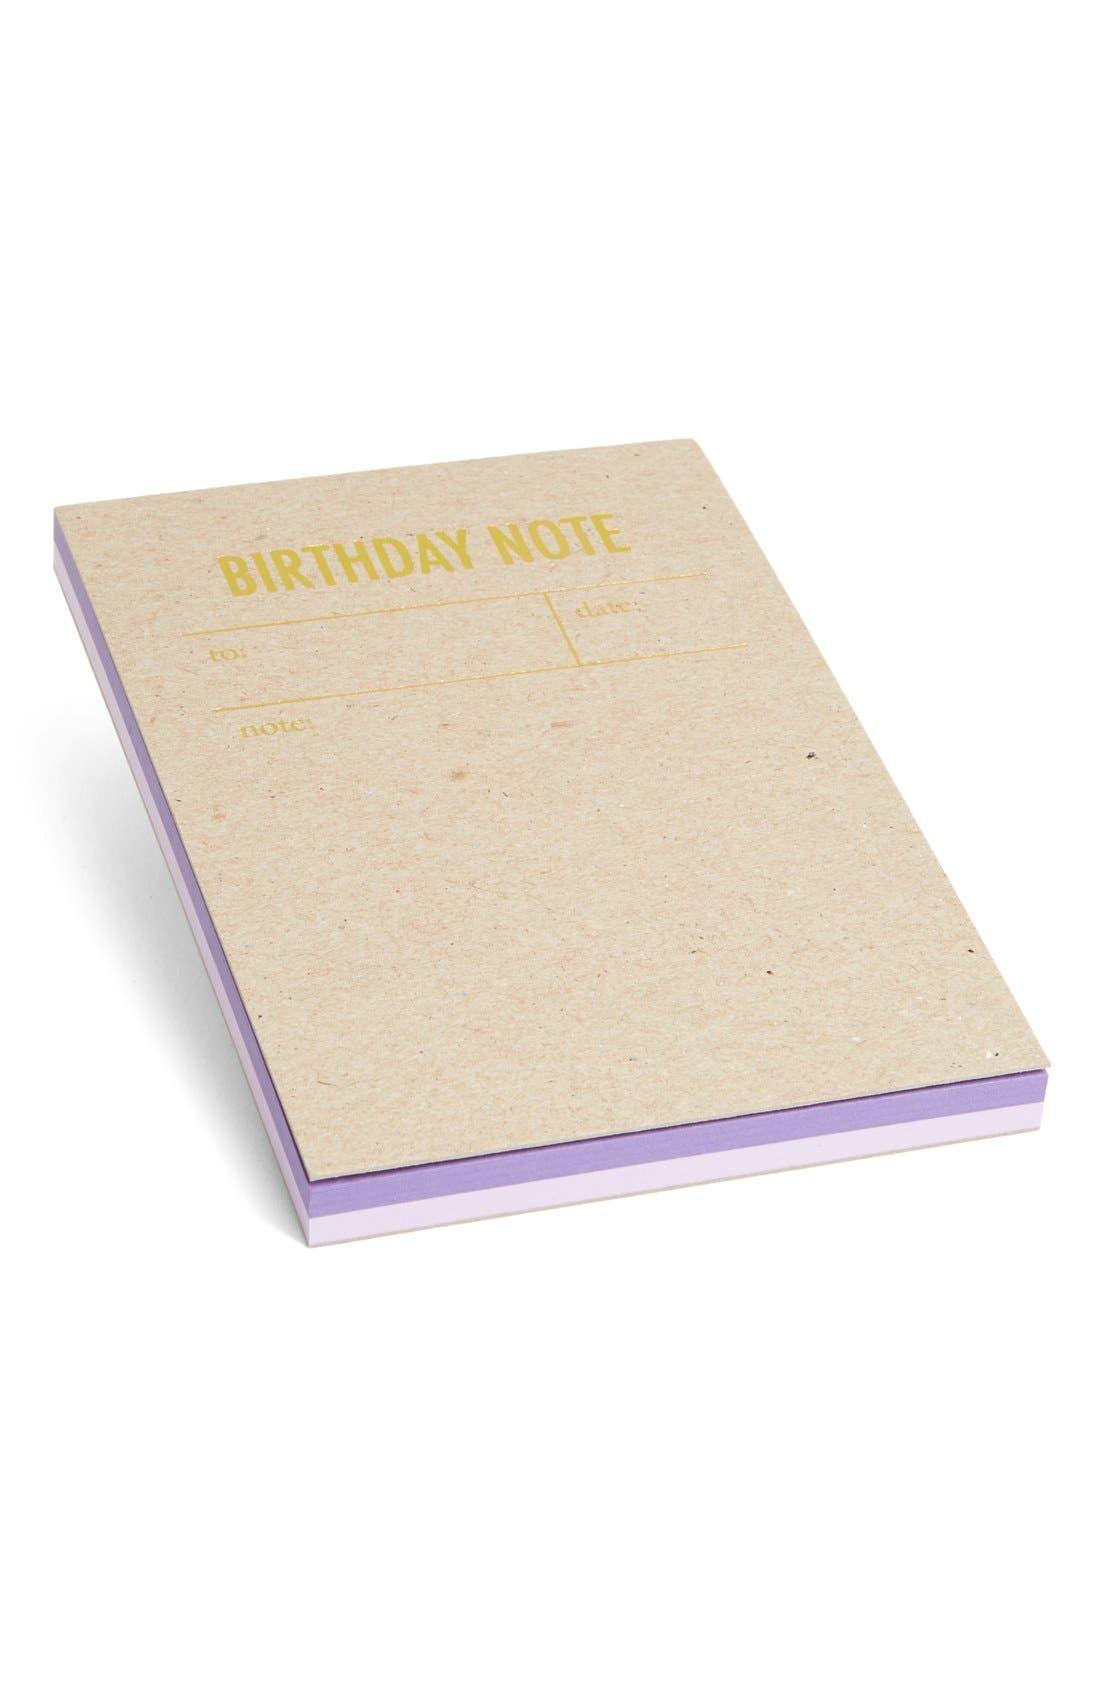 Alternate Image 1 Selected - Tokketok 'Birthday Note' Letterpress Note Cards (Set of 30)